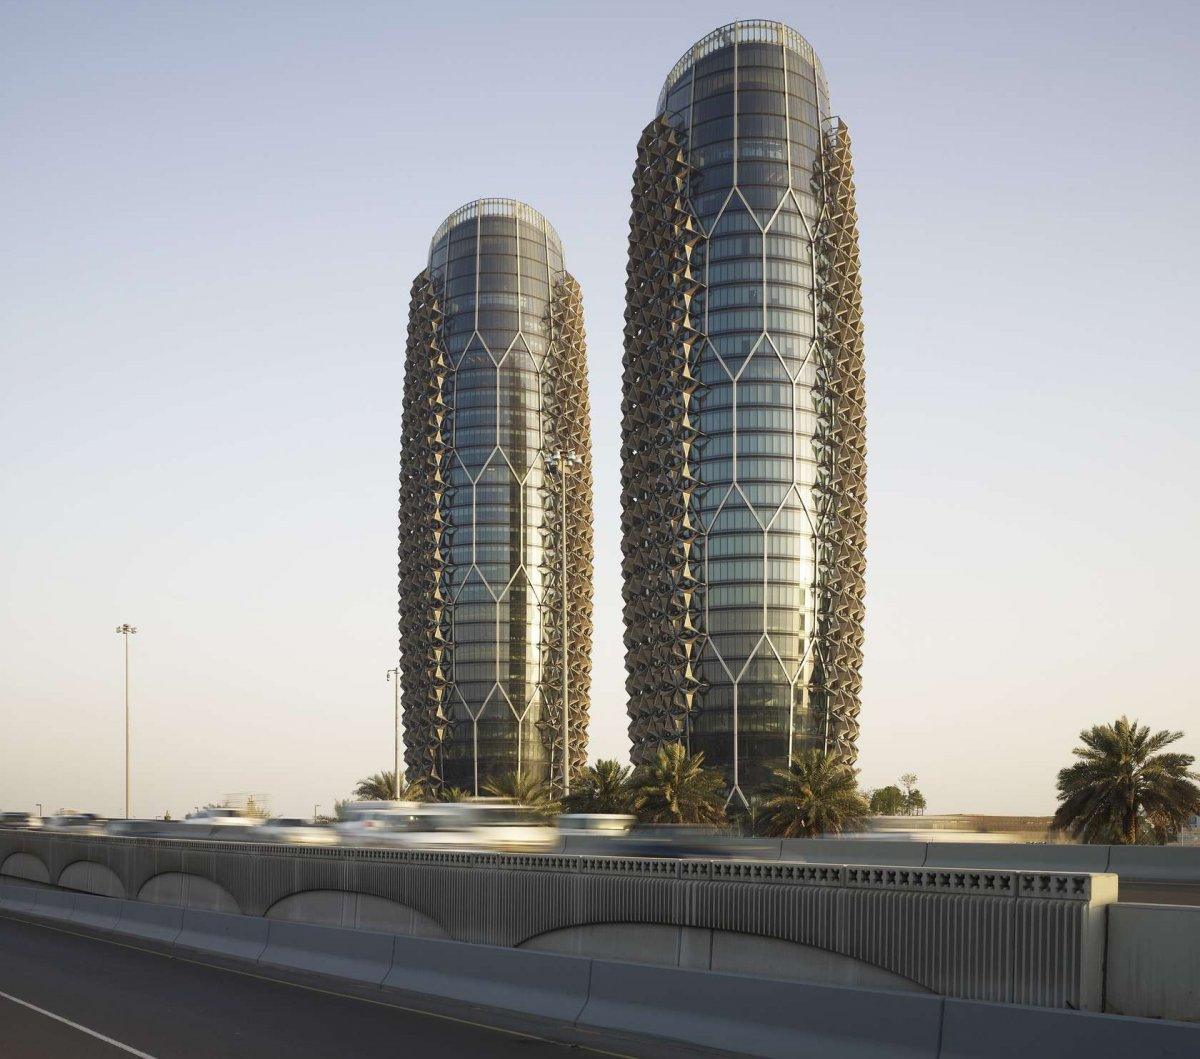 al-bahr-towers-abu-dhabi-aedas-architects